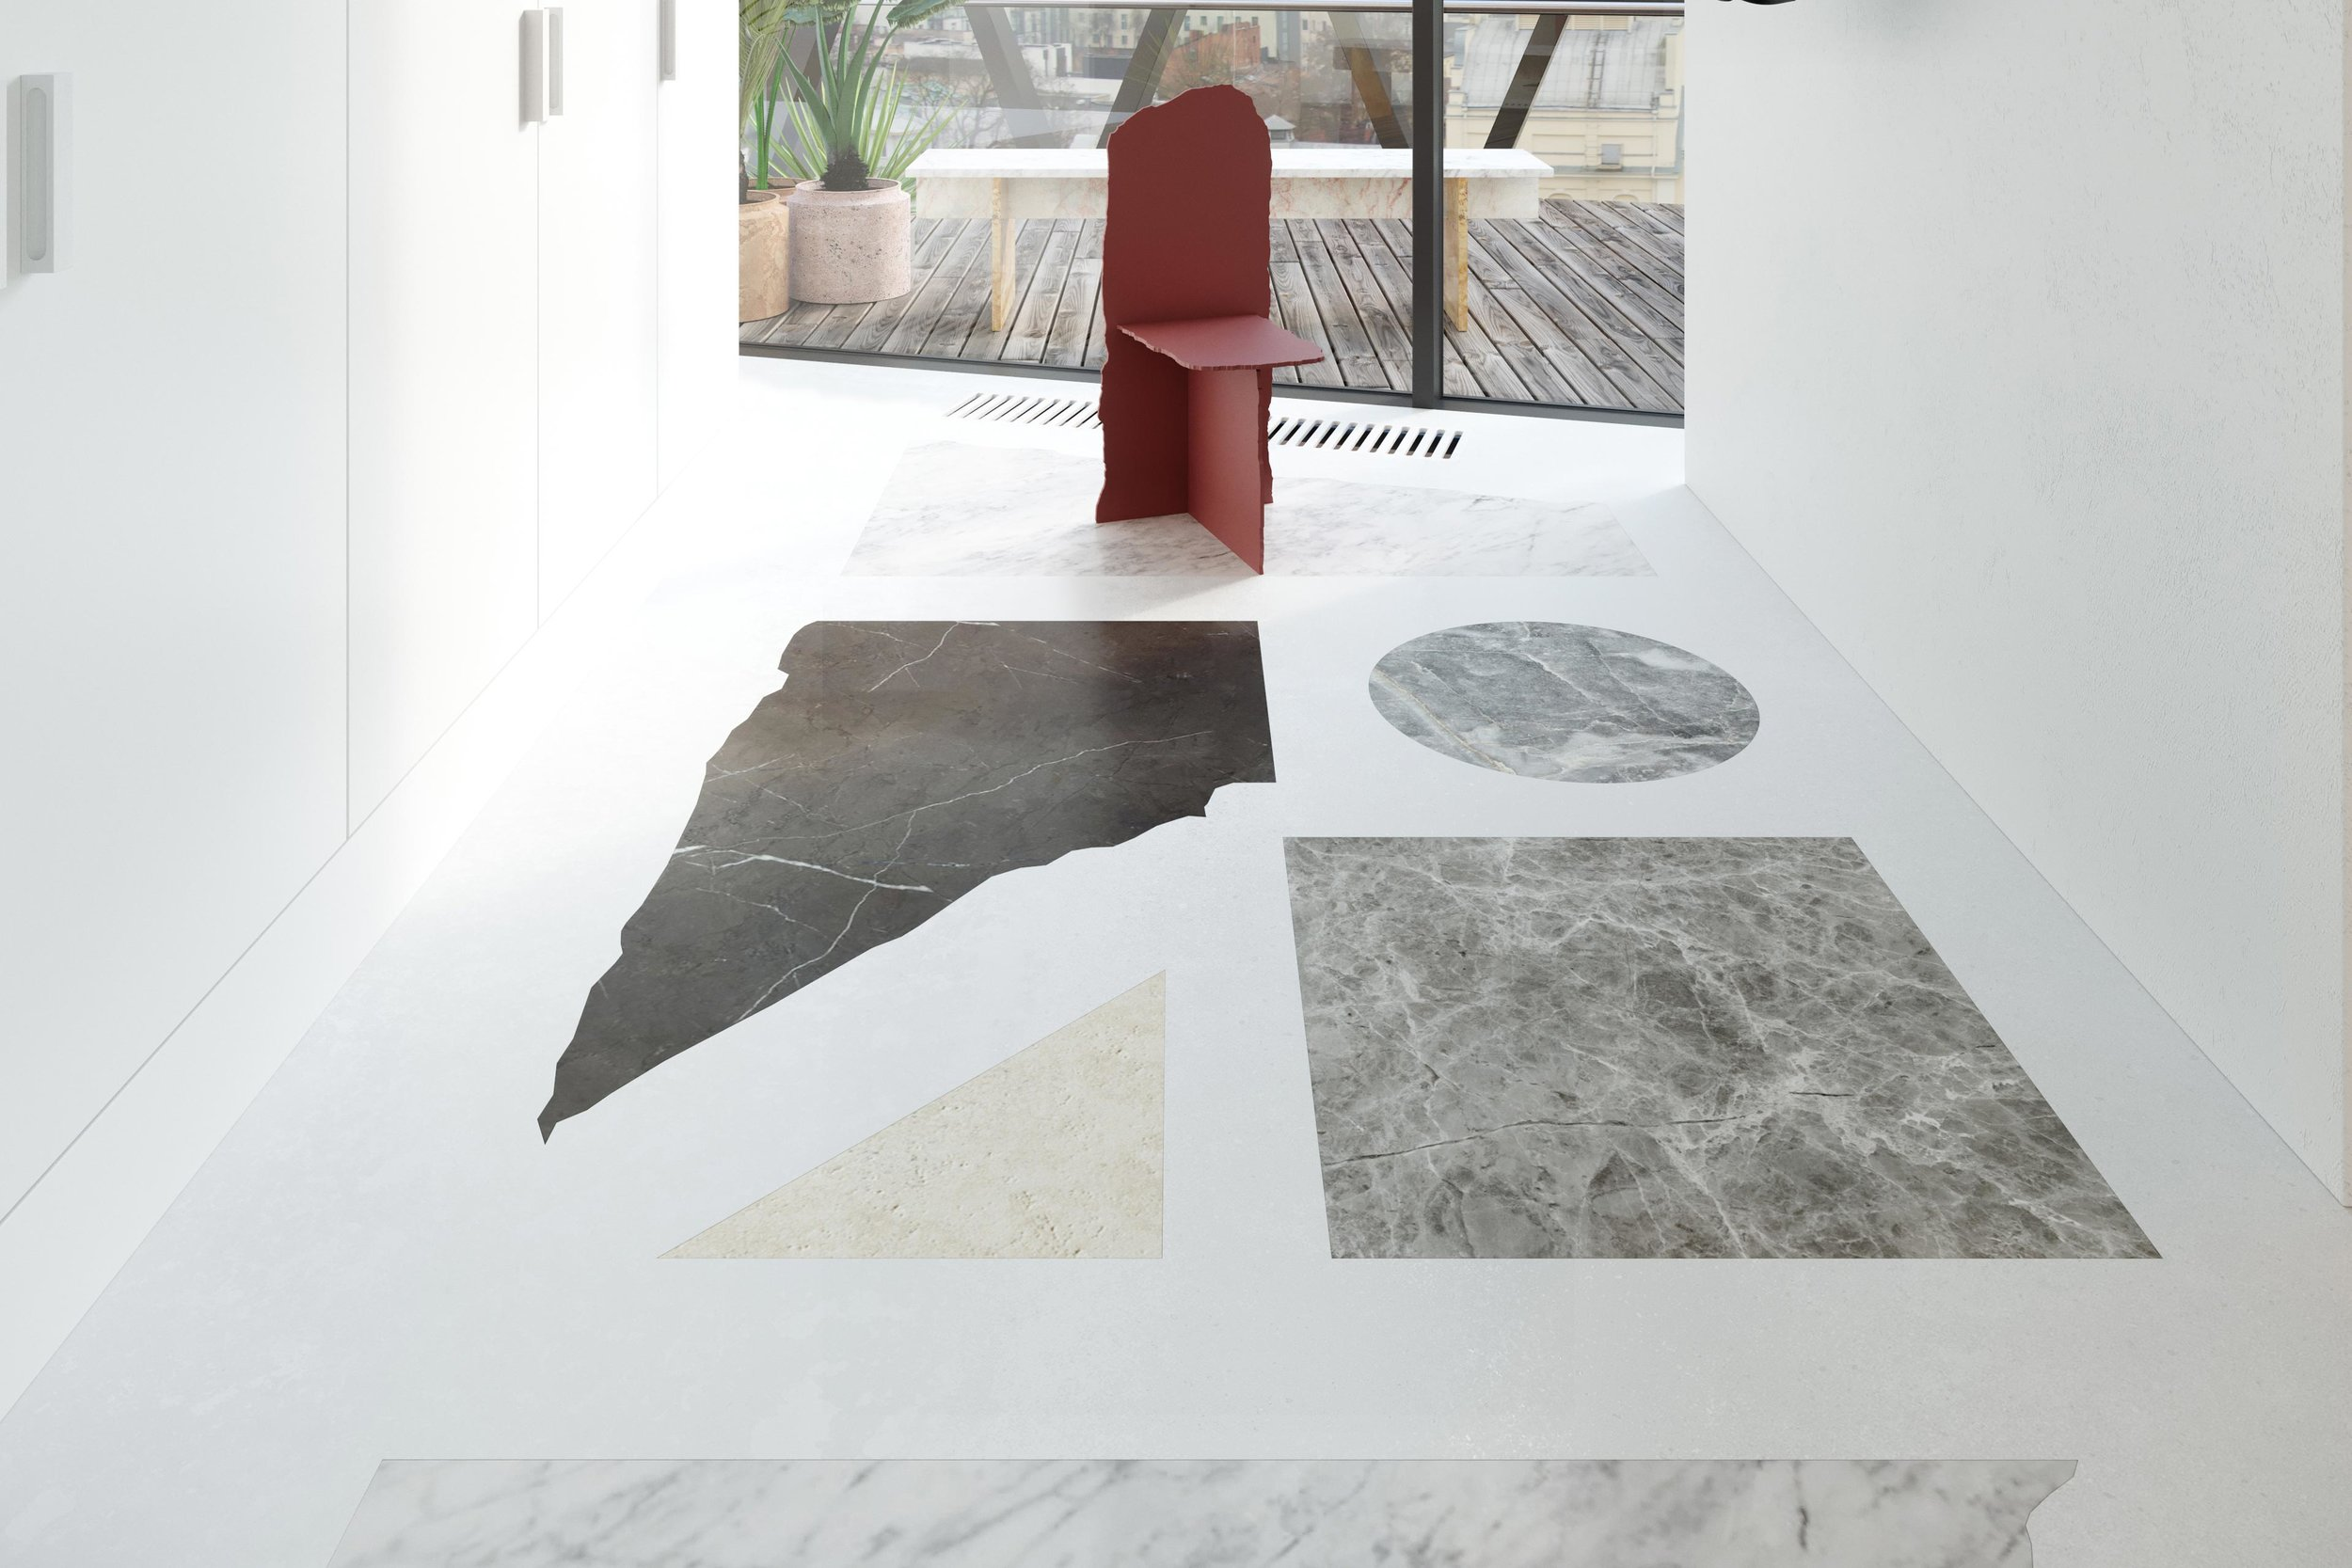 New York 3D visualisation agency